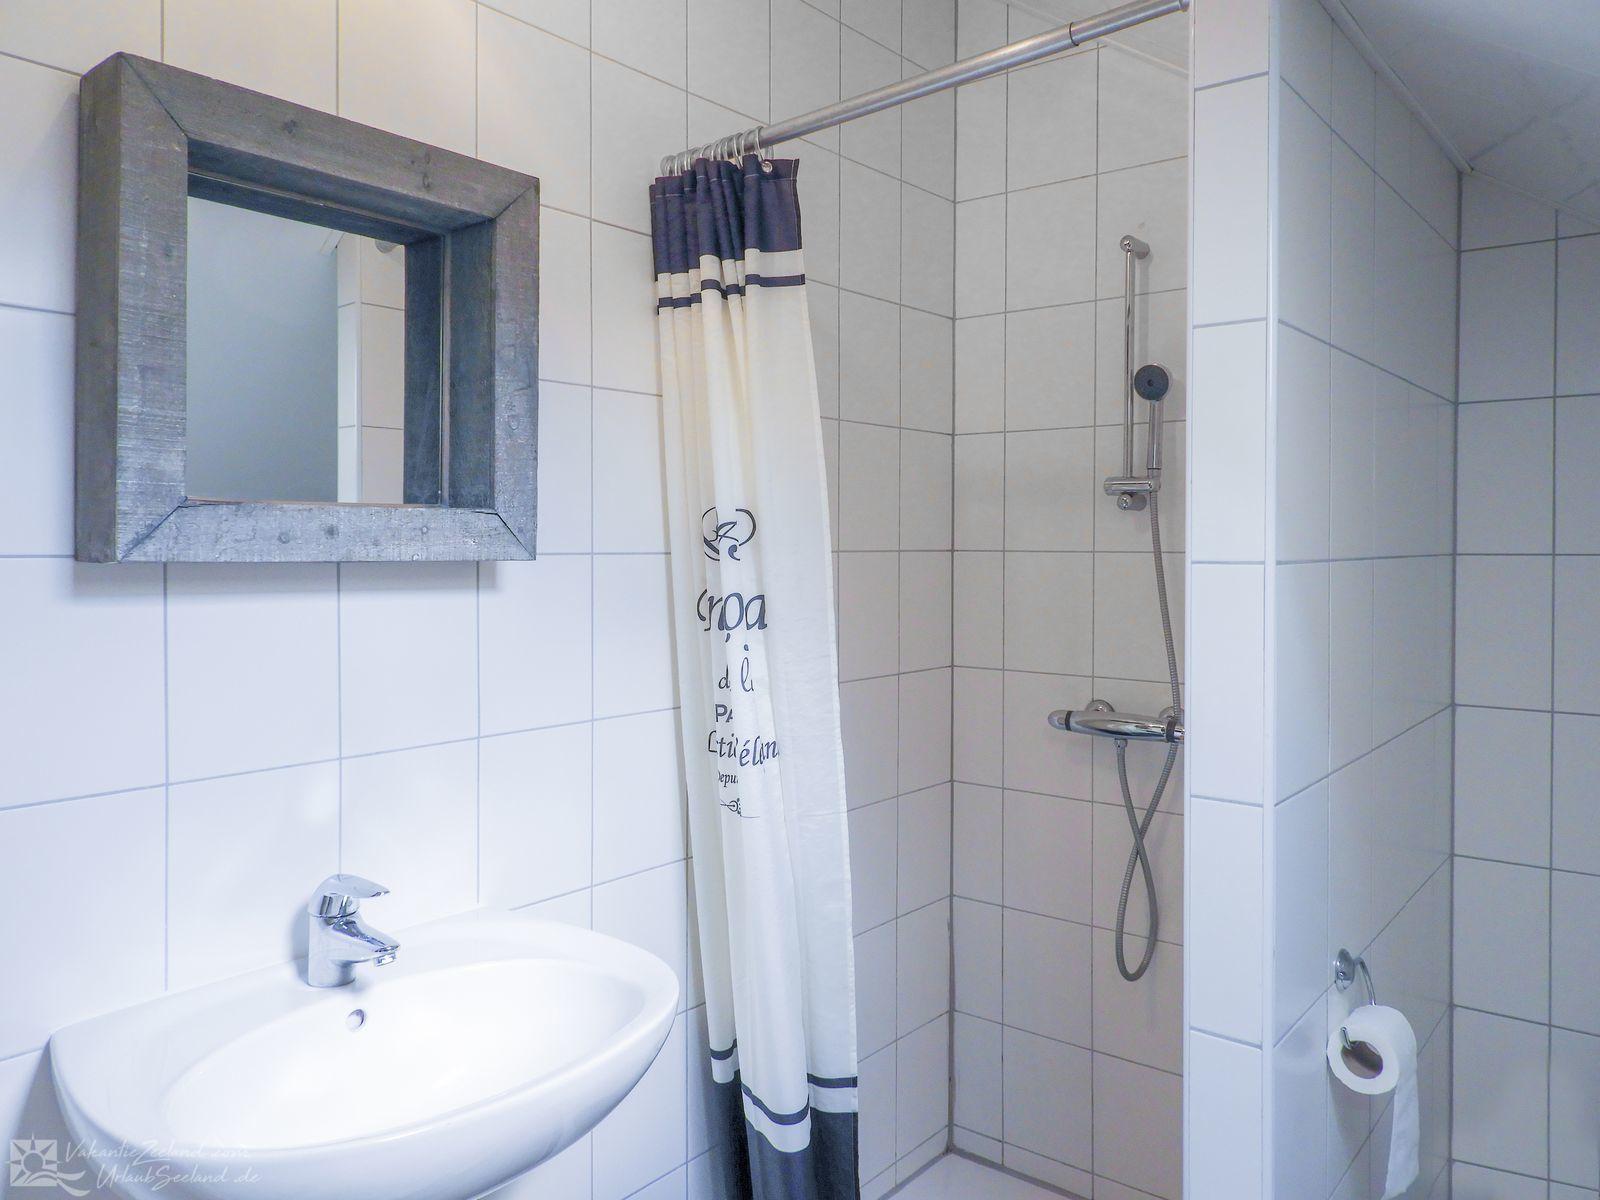 VZ504 Ferienunterkunft in Biggekerke